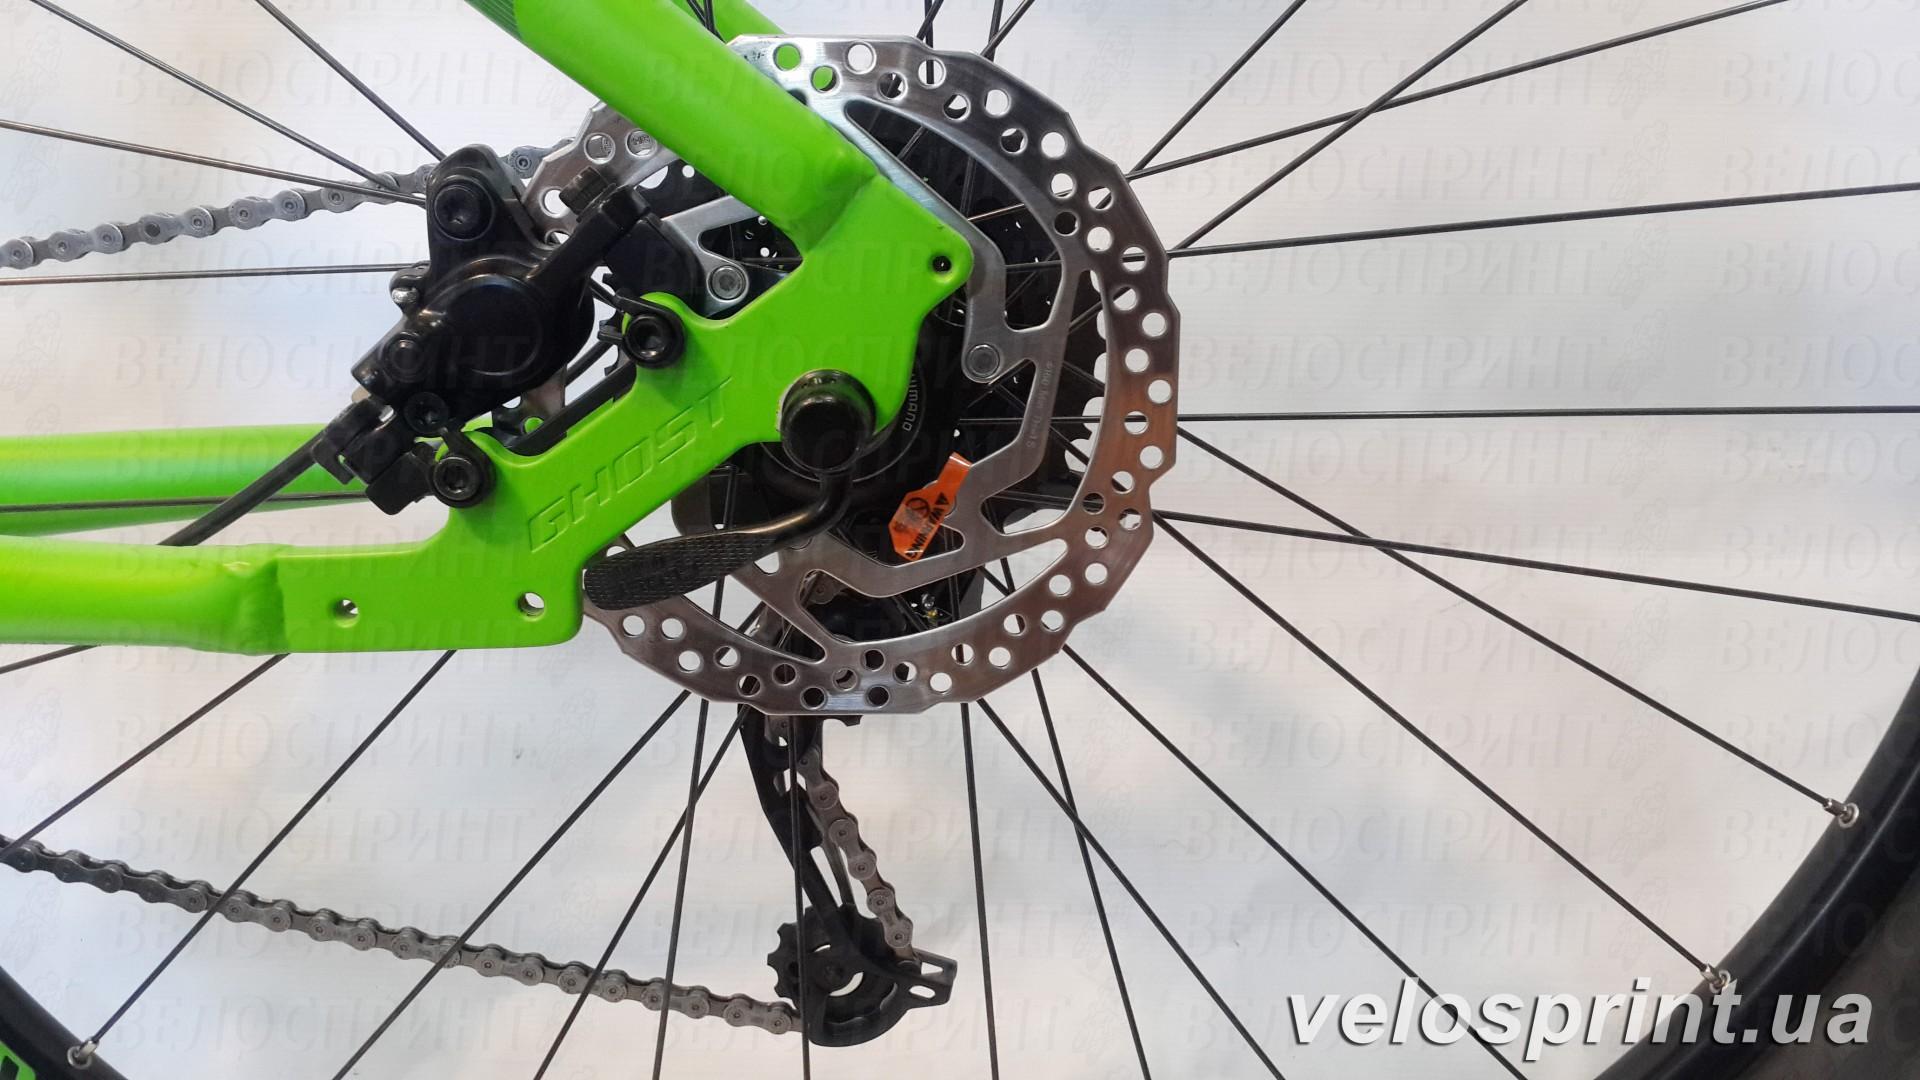 Велосипед GHOST Tacana 3 green/darkgreen/black задний тормоз год 2016